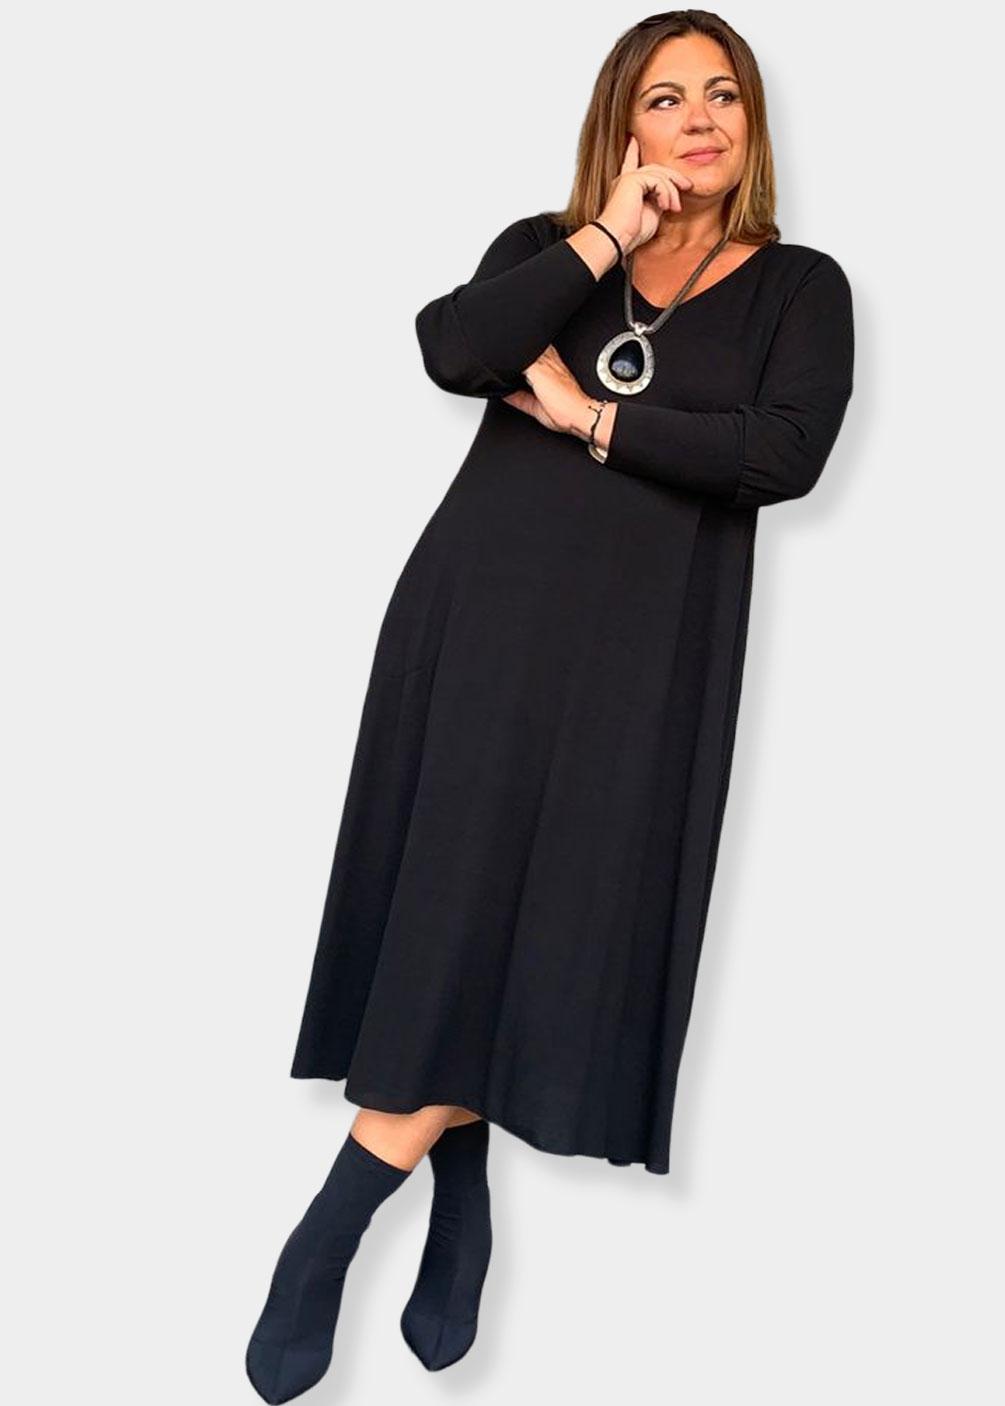 vestido negro plus size